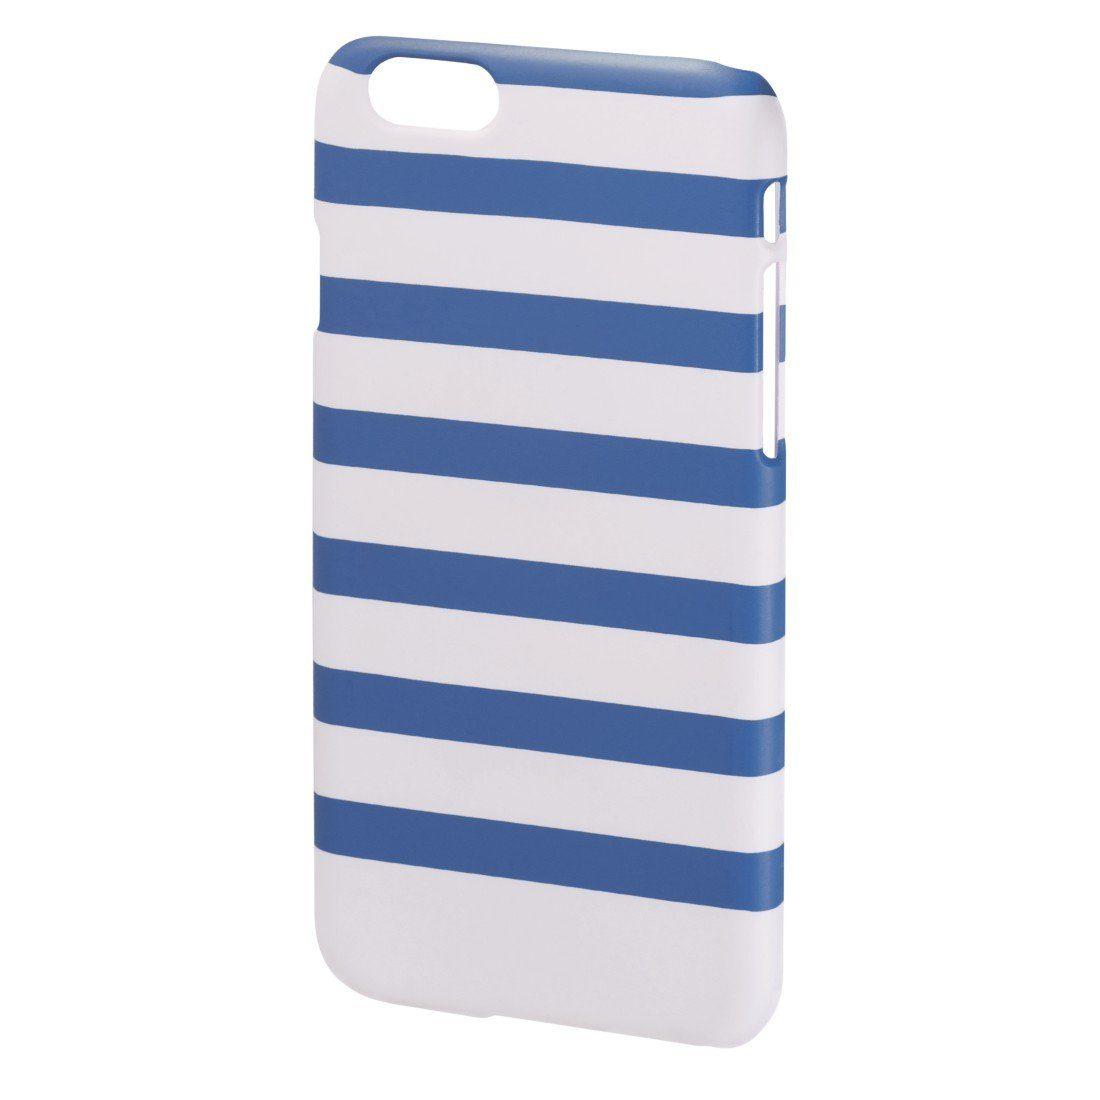 Hama Cover Stripes für Apple iPhone 6, Blau/Weiß